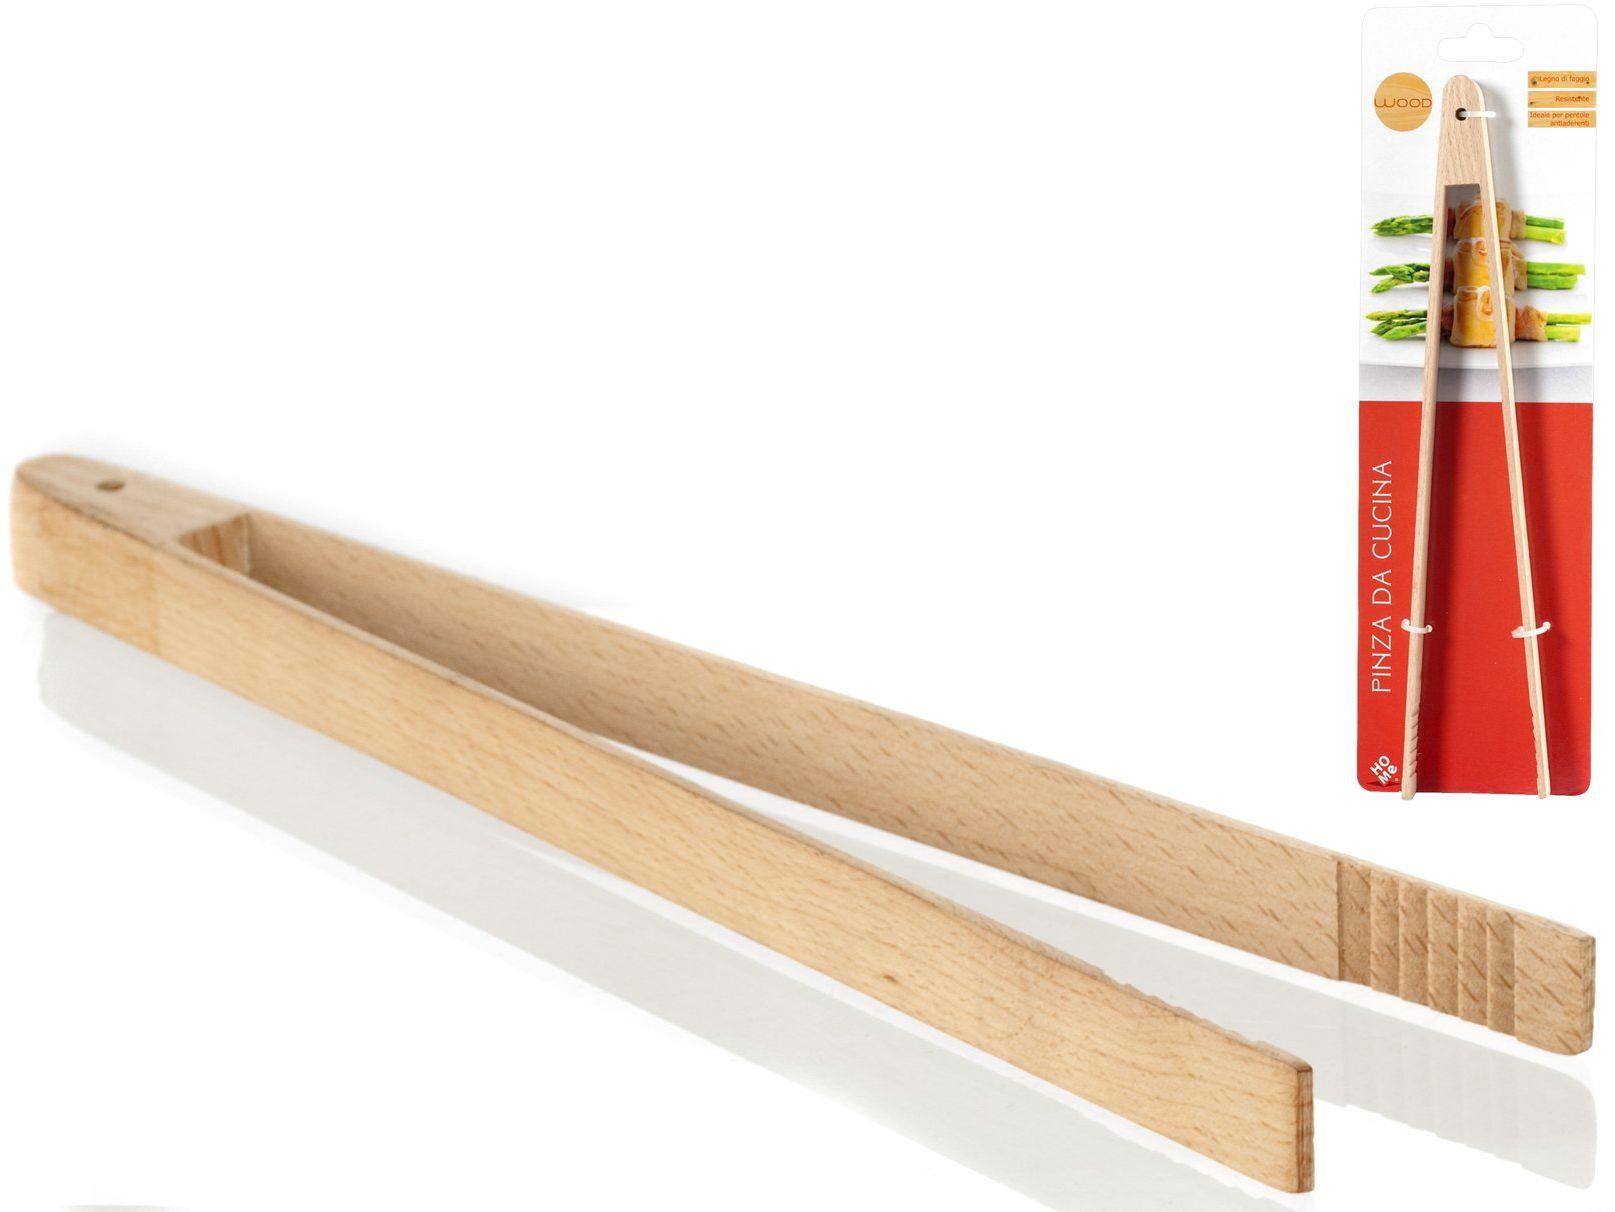 HOME 8342500 szczypce drewniane, buk, 6 sztuk